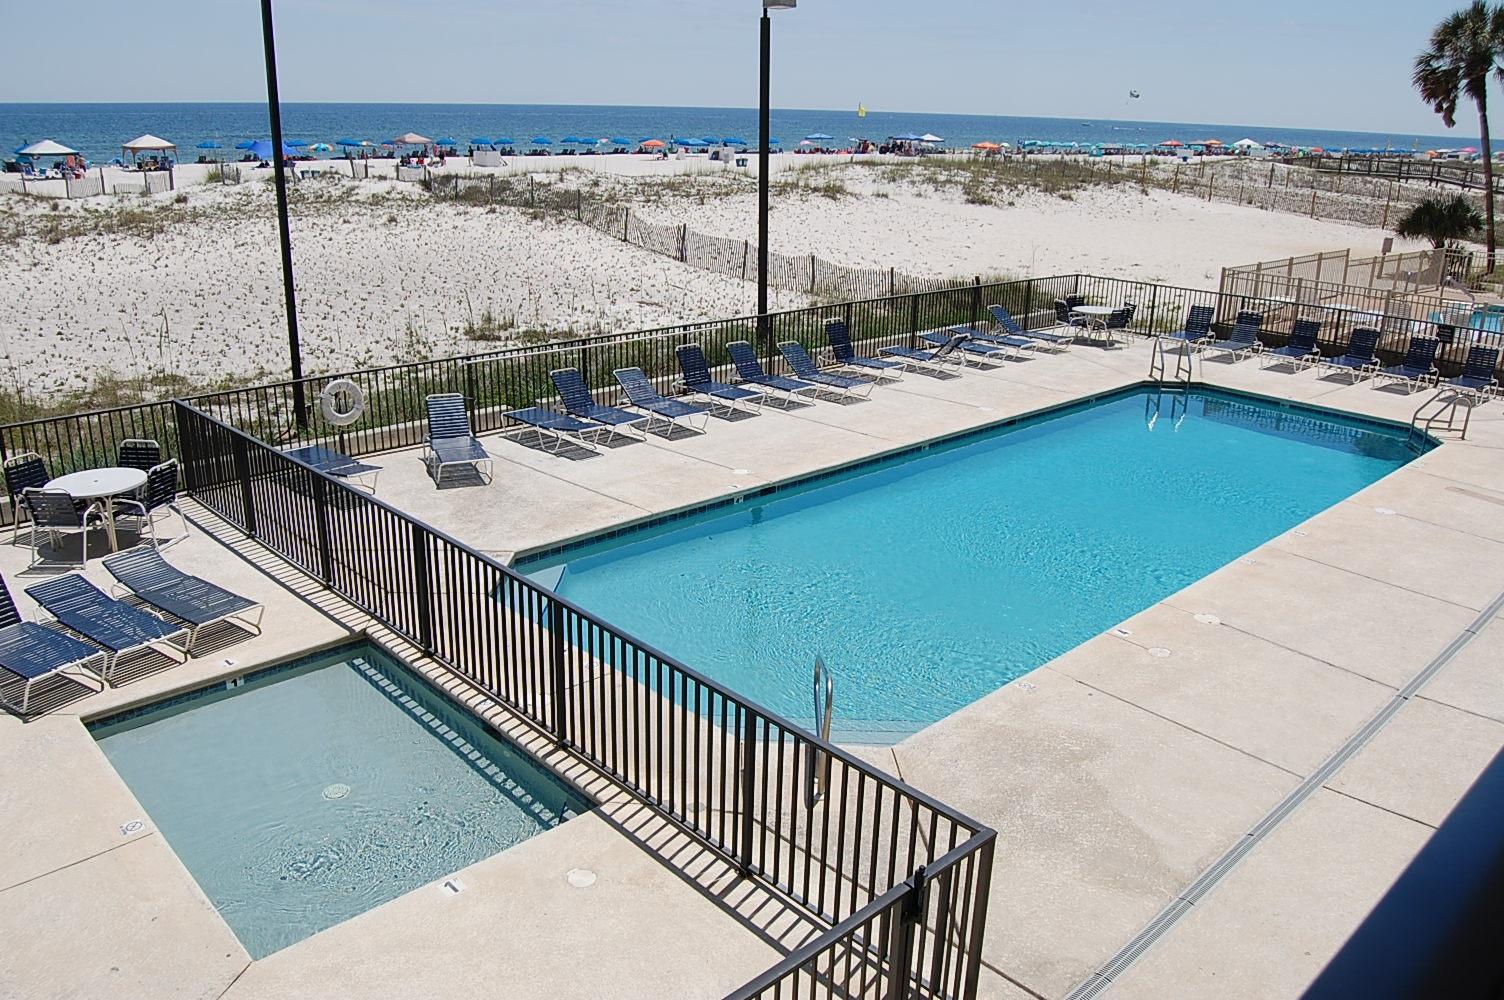 Island Winds West 177 Condo rental in Island Winds West in Gulf Shores Alabama - #10